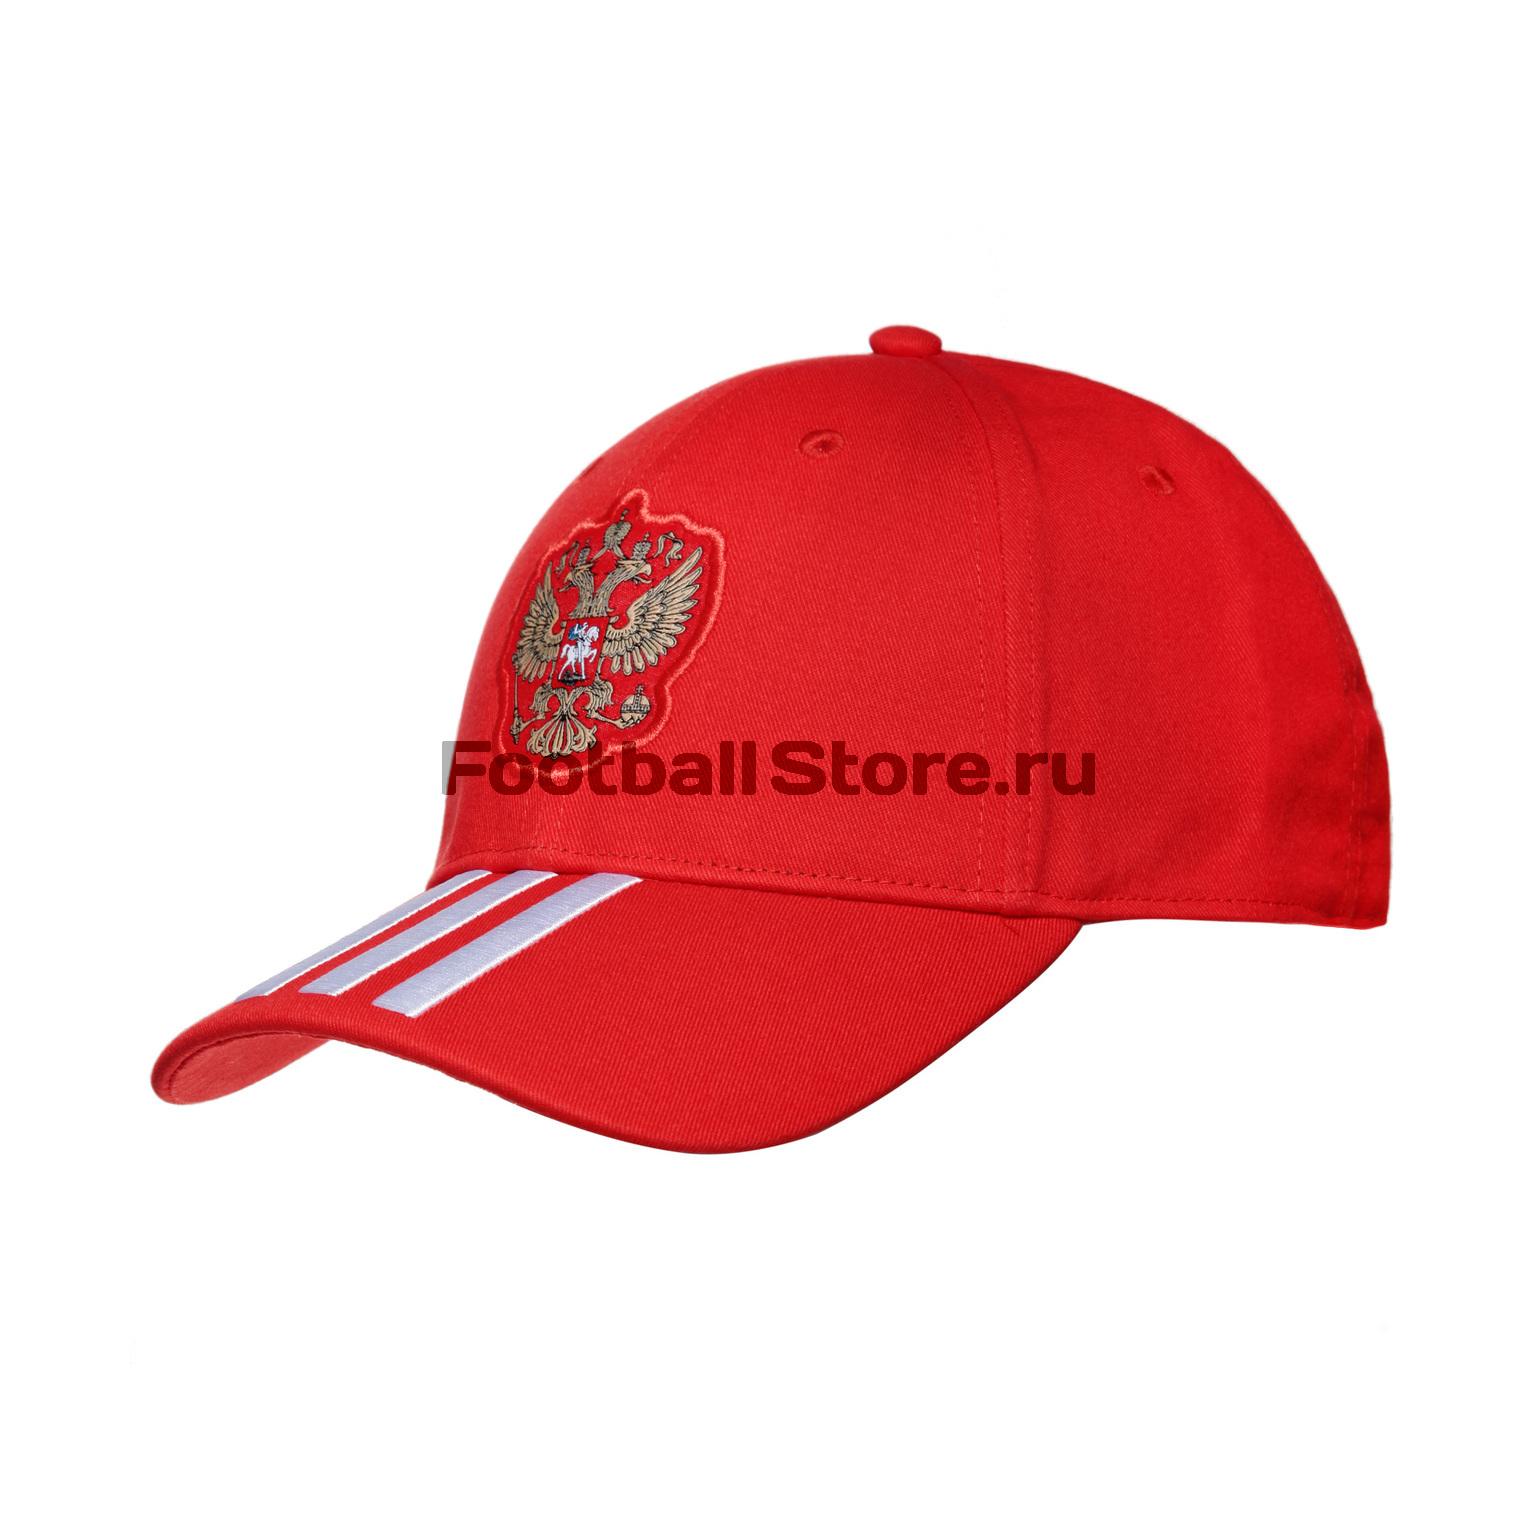 Бейсболка Adidas Russia 3S Cap CF4973